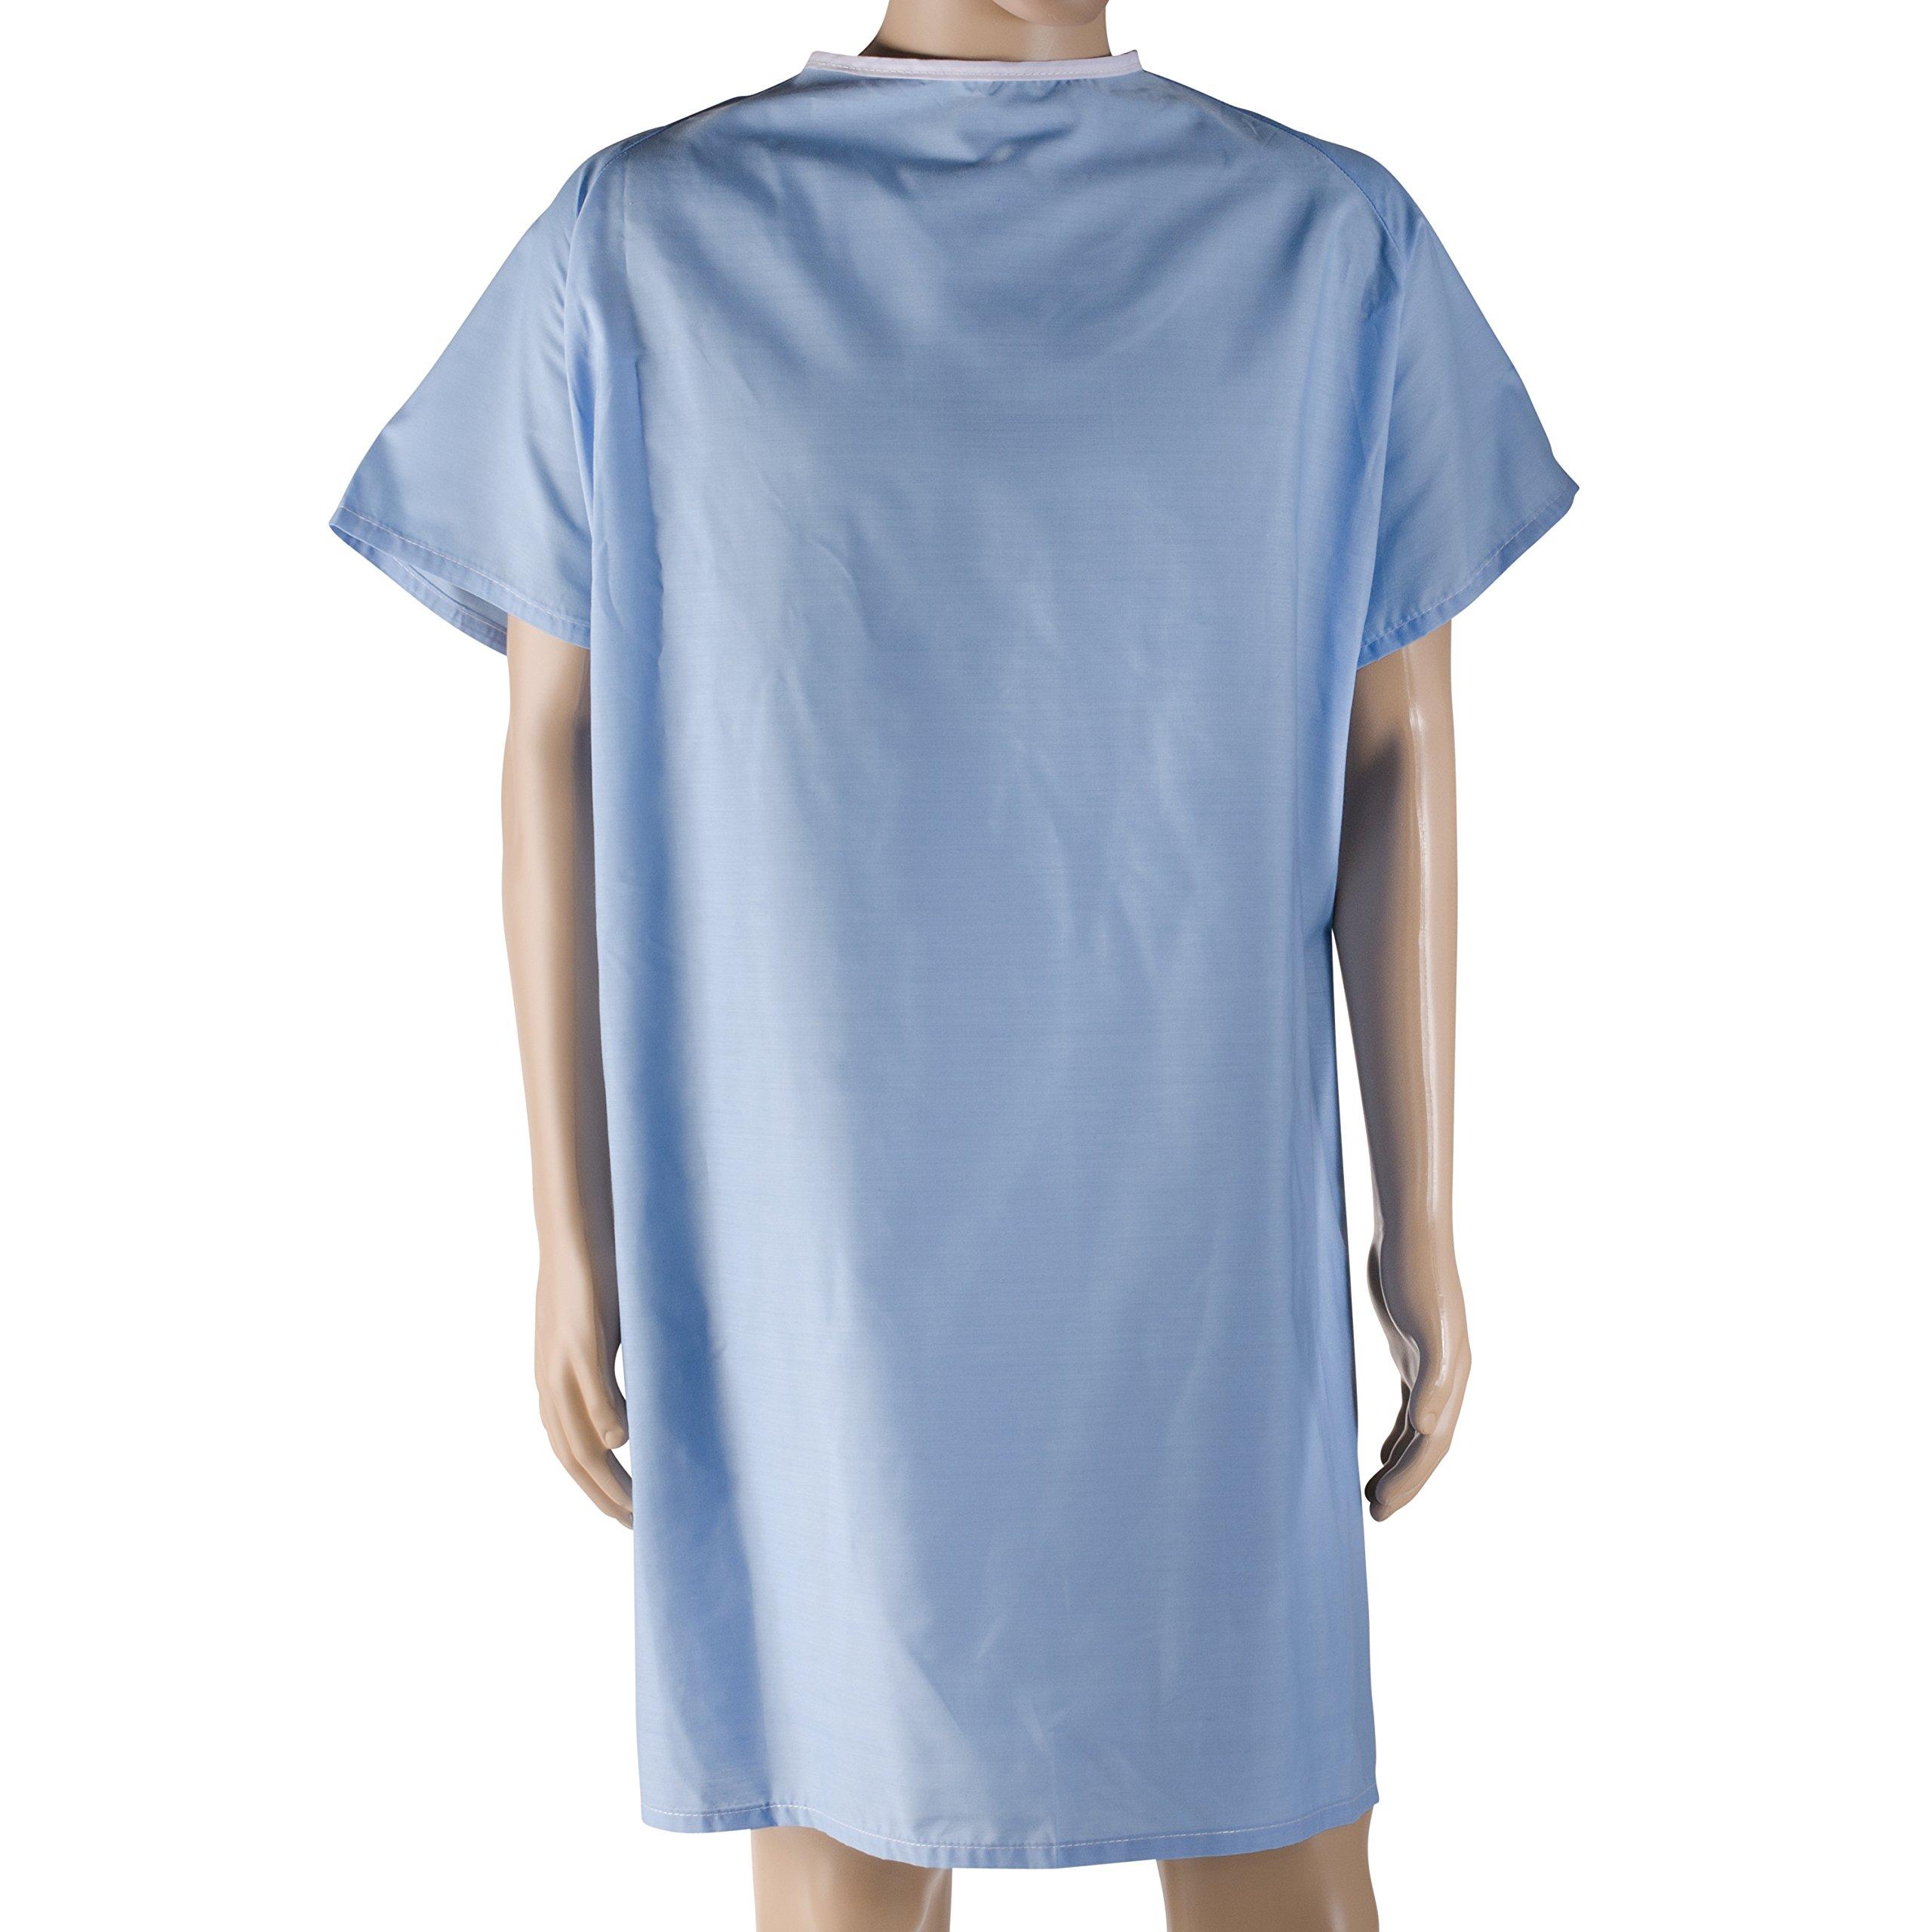 Amazon.com: DMI Hospital Gown, Easy Access Patient Gown, Blue ...